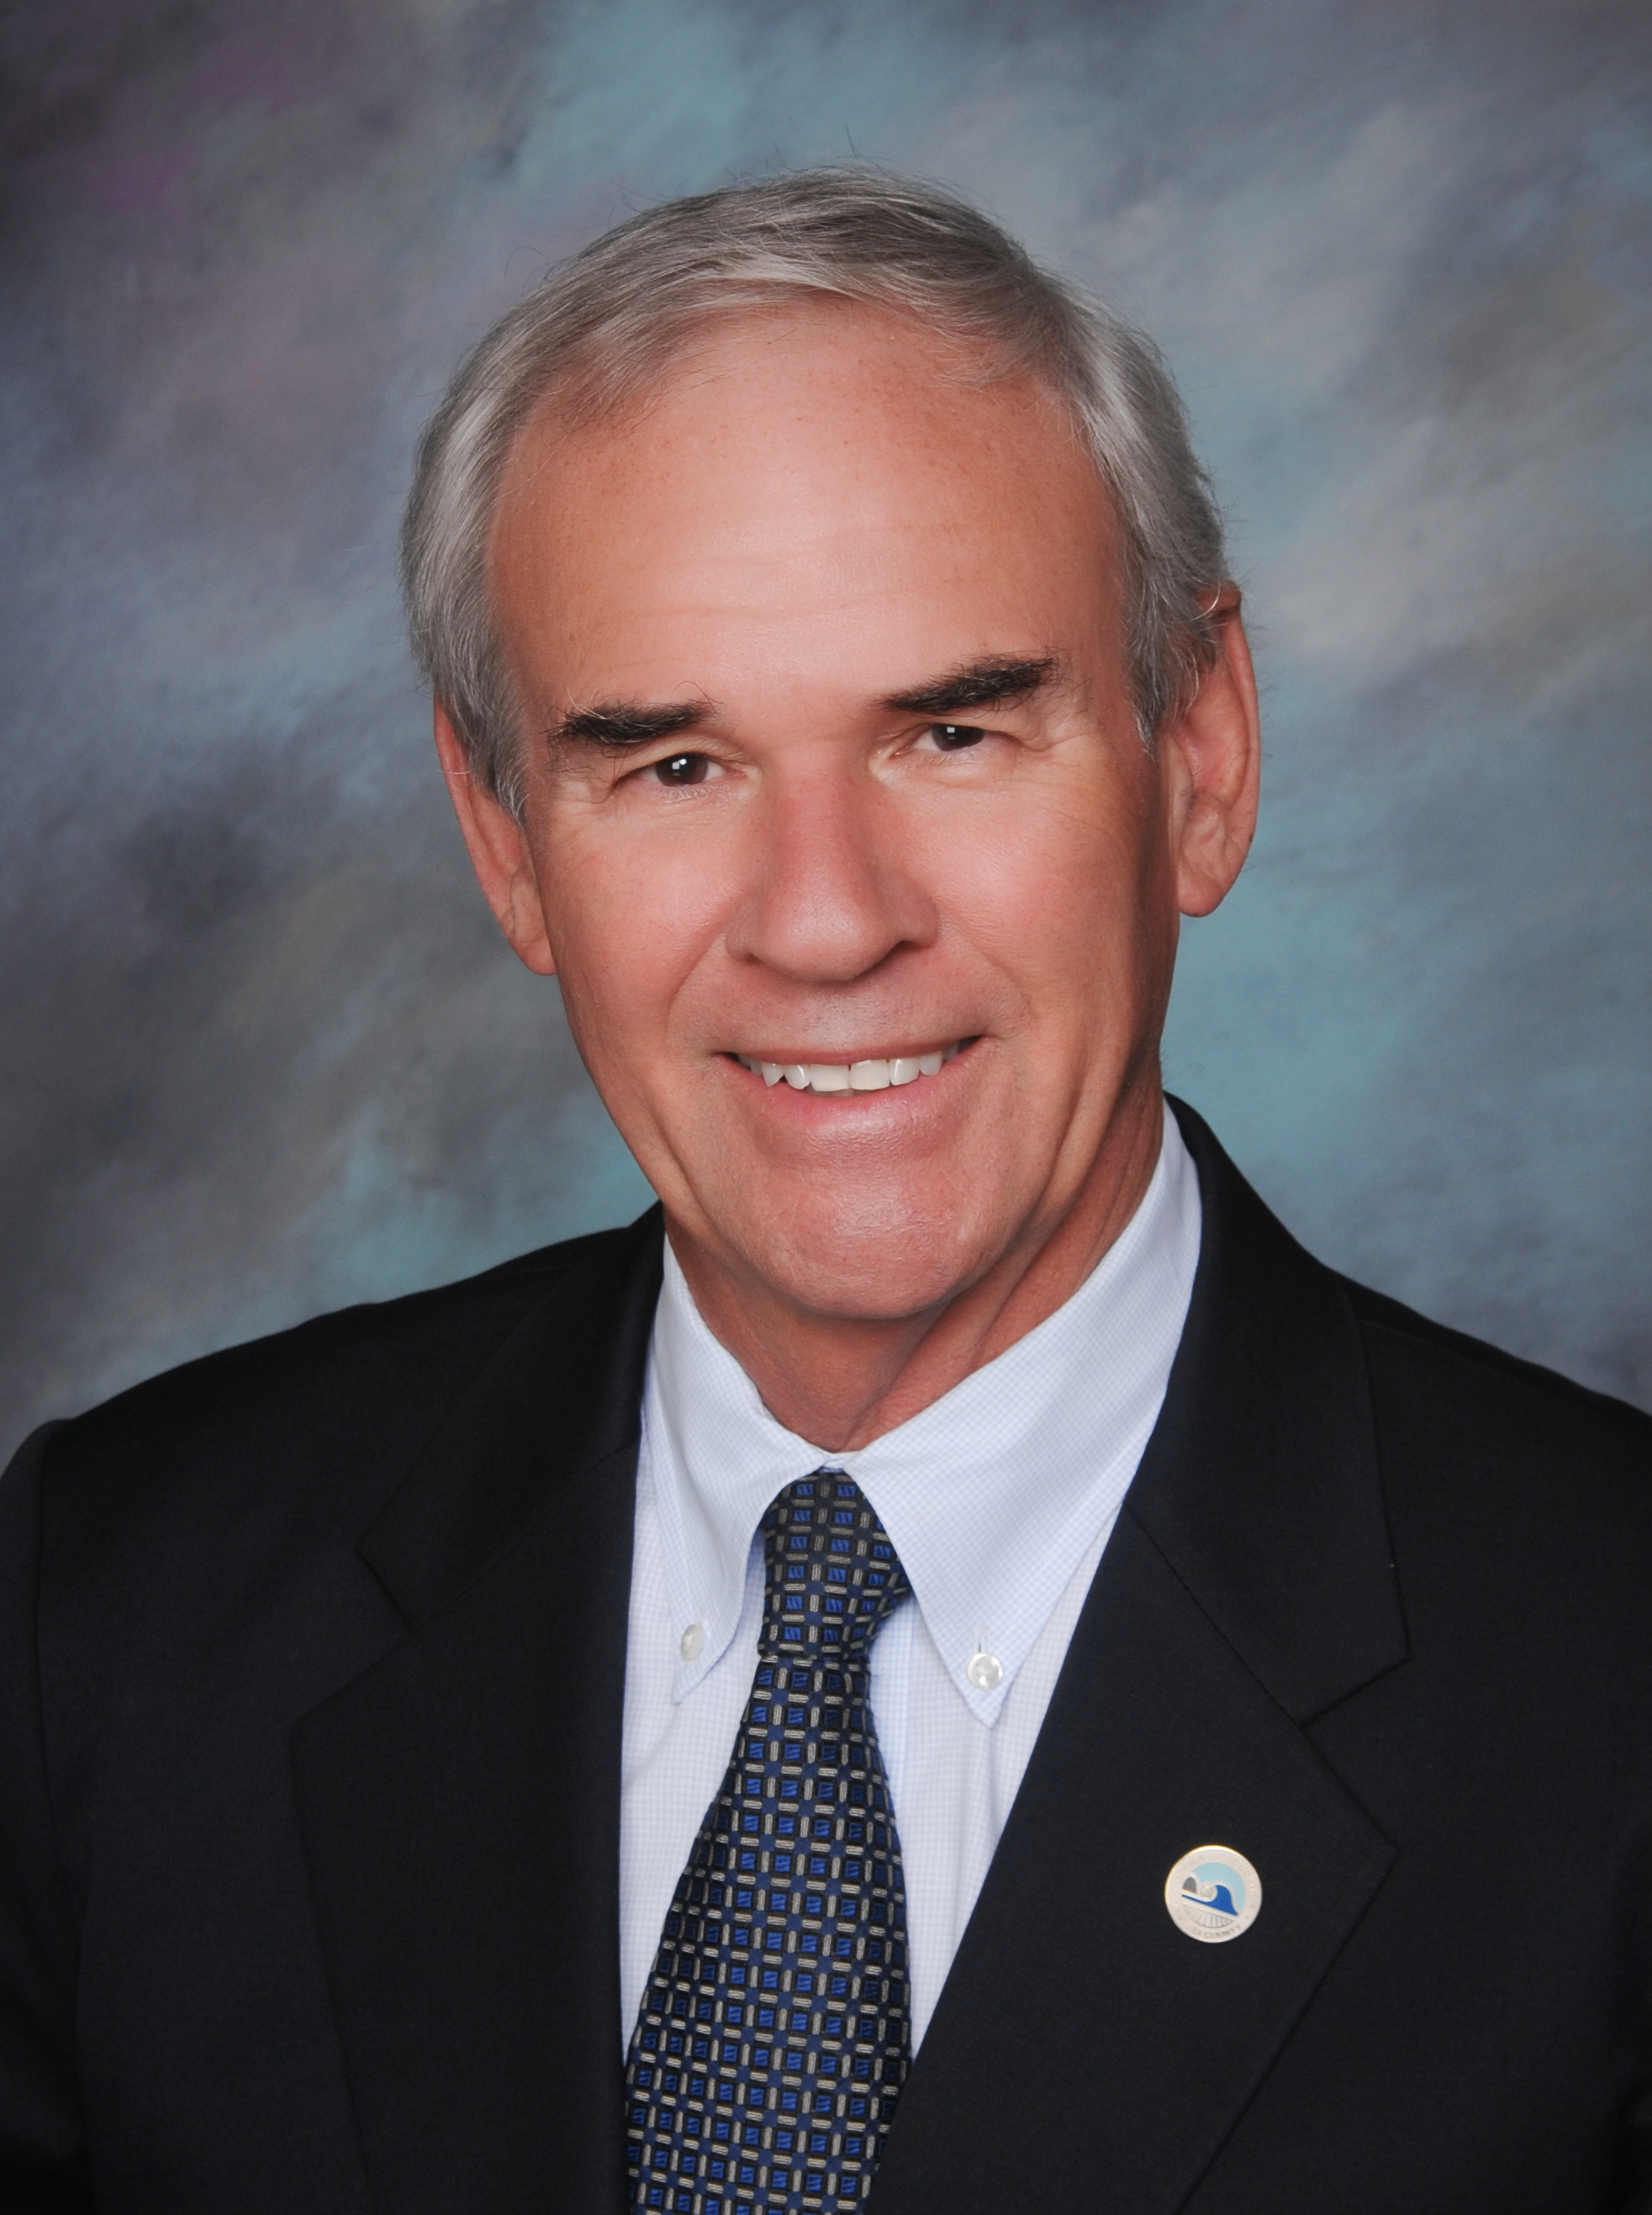 Ventura County Superintendent of Schools Stan Mantooth Announces Retirement